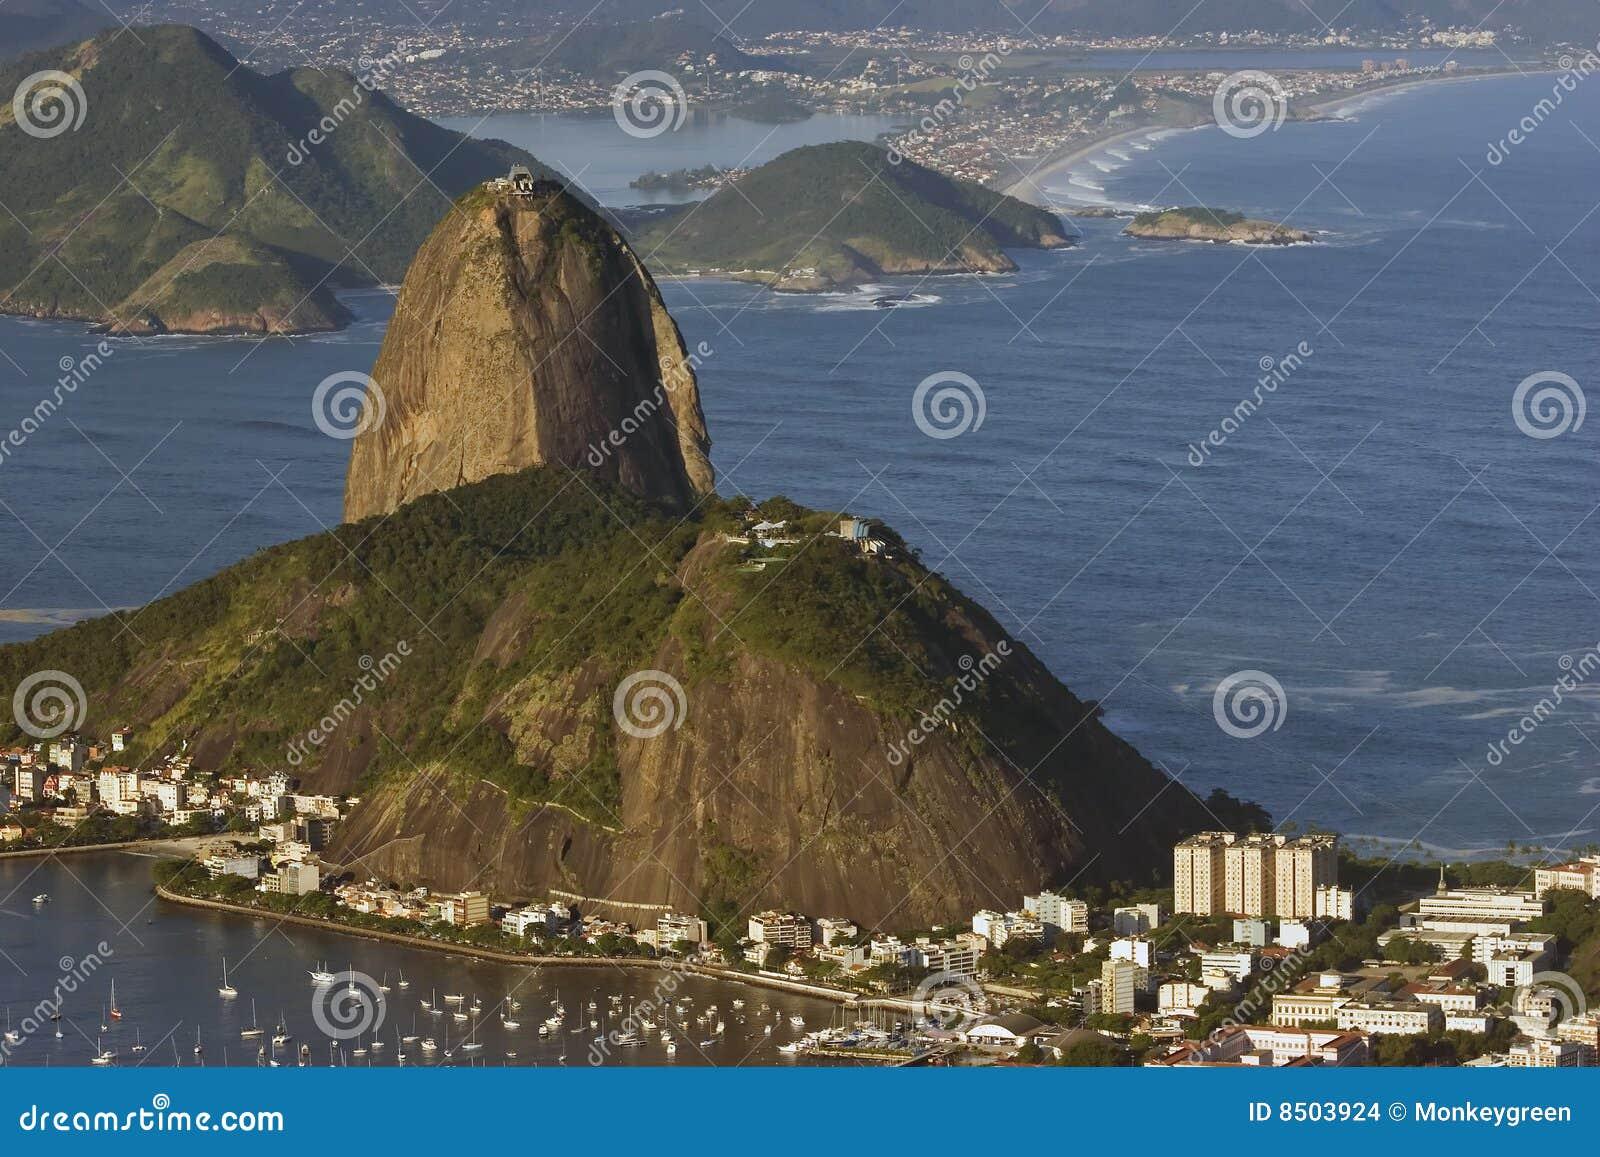 Sugar loaf mountain, Rio de Janiero, Brazil